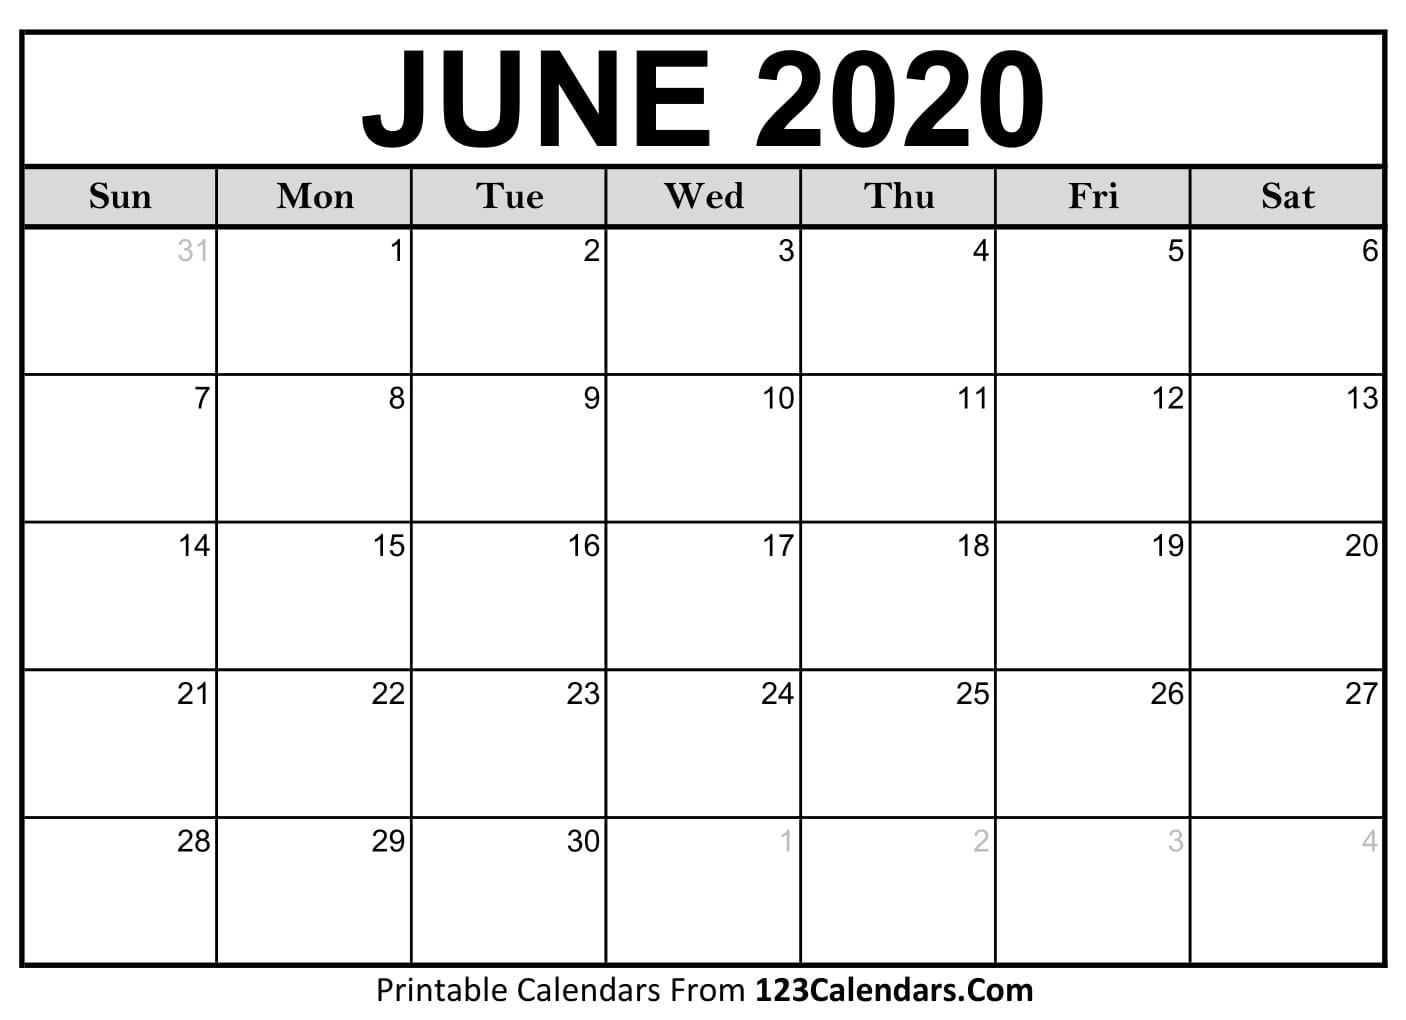 June 2020 Printable Calendar   123Calendars-Printable Calendar 2020 Monthly June July